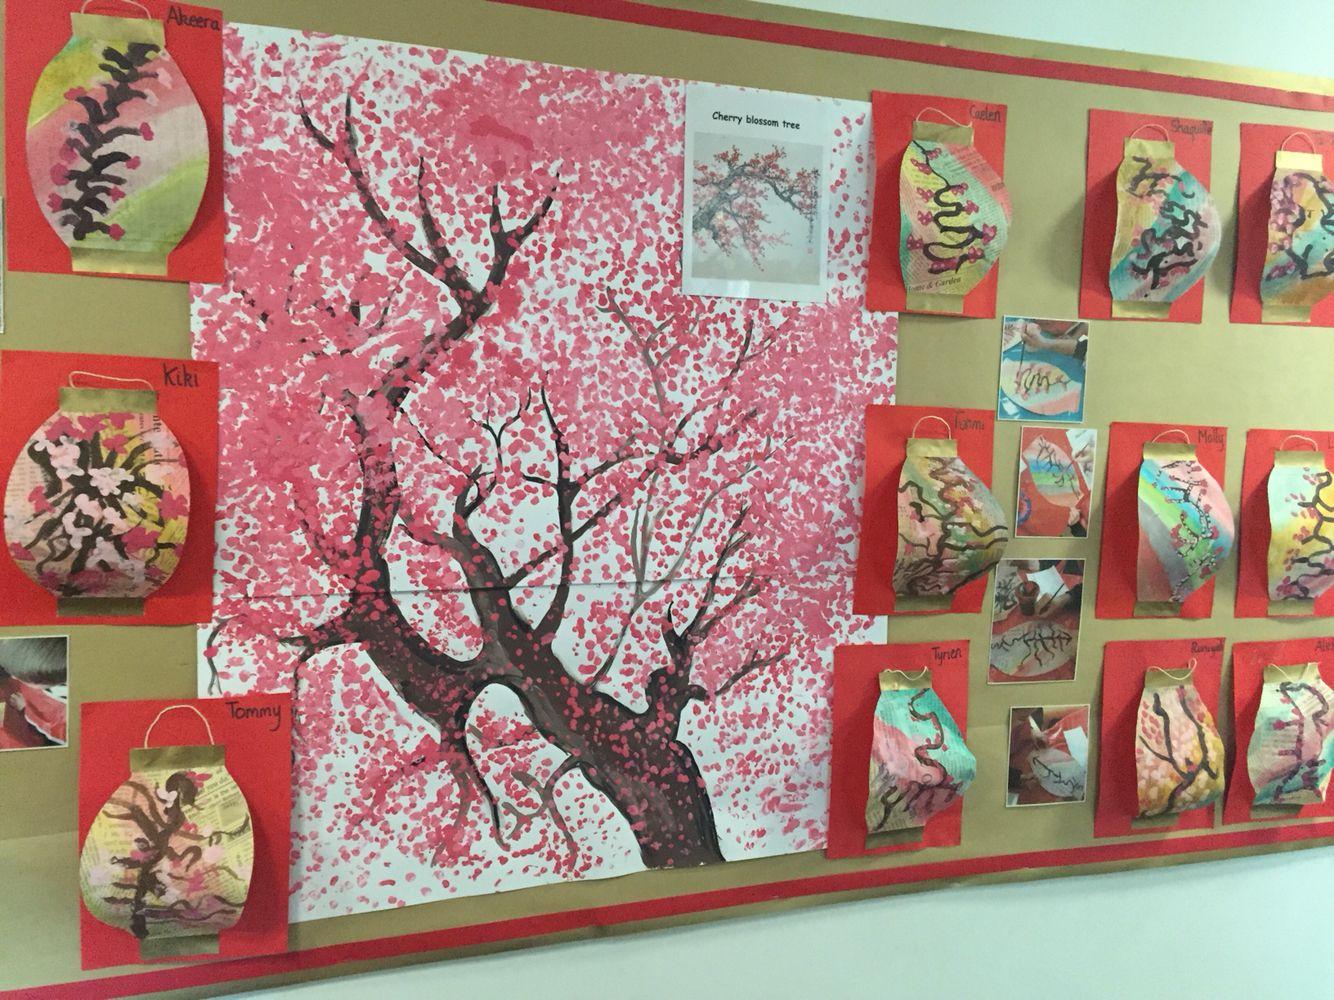 Spring Blossom Classroom Displays Display Spring Blossom